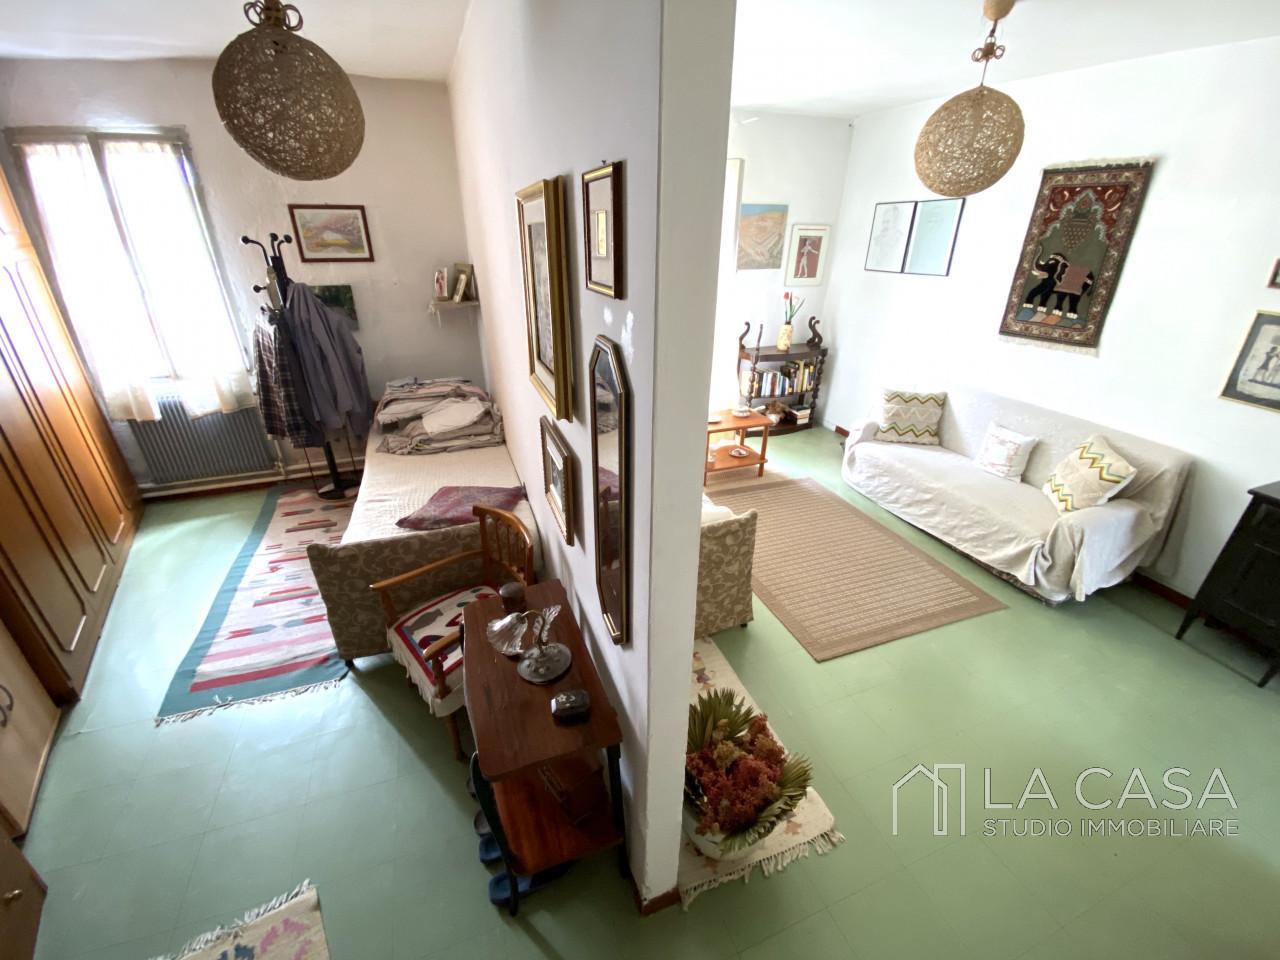 Palazzo plurifamiliare in vendita a Valvasone Arzene - Rif. P3 https://images.gestionaleimmobiliare.it/foto/annunci/200827/2284141/1280x1280/013__img_3717_wmk_0.jpg